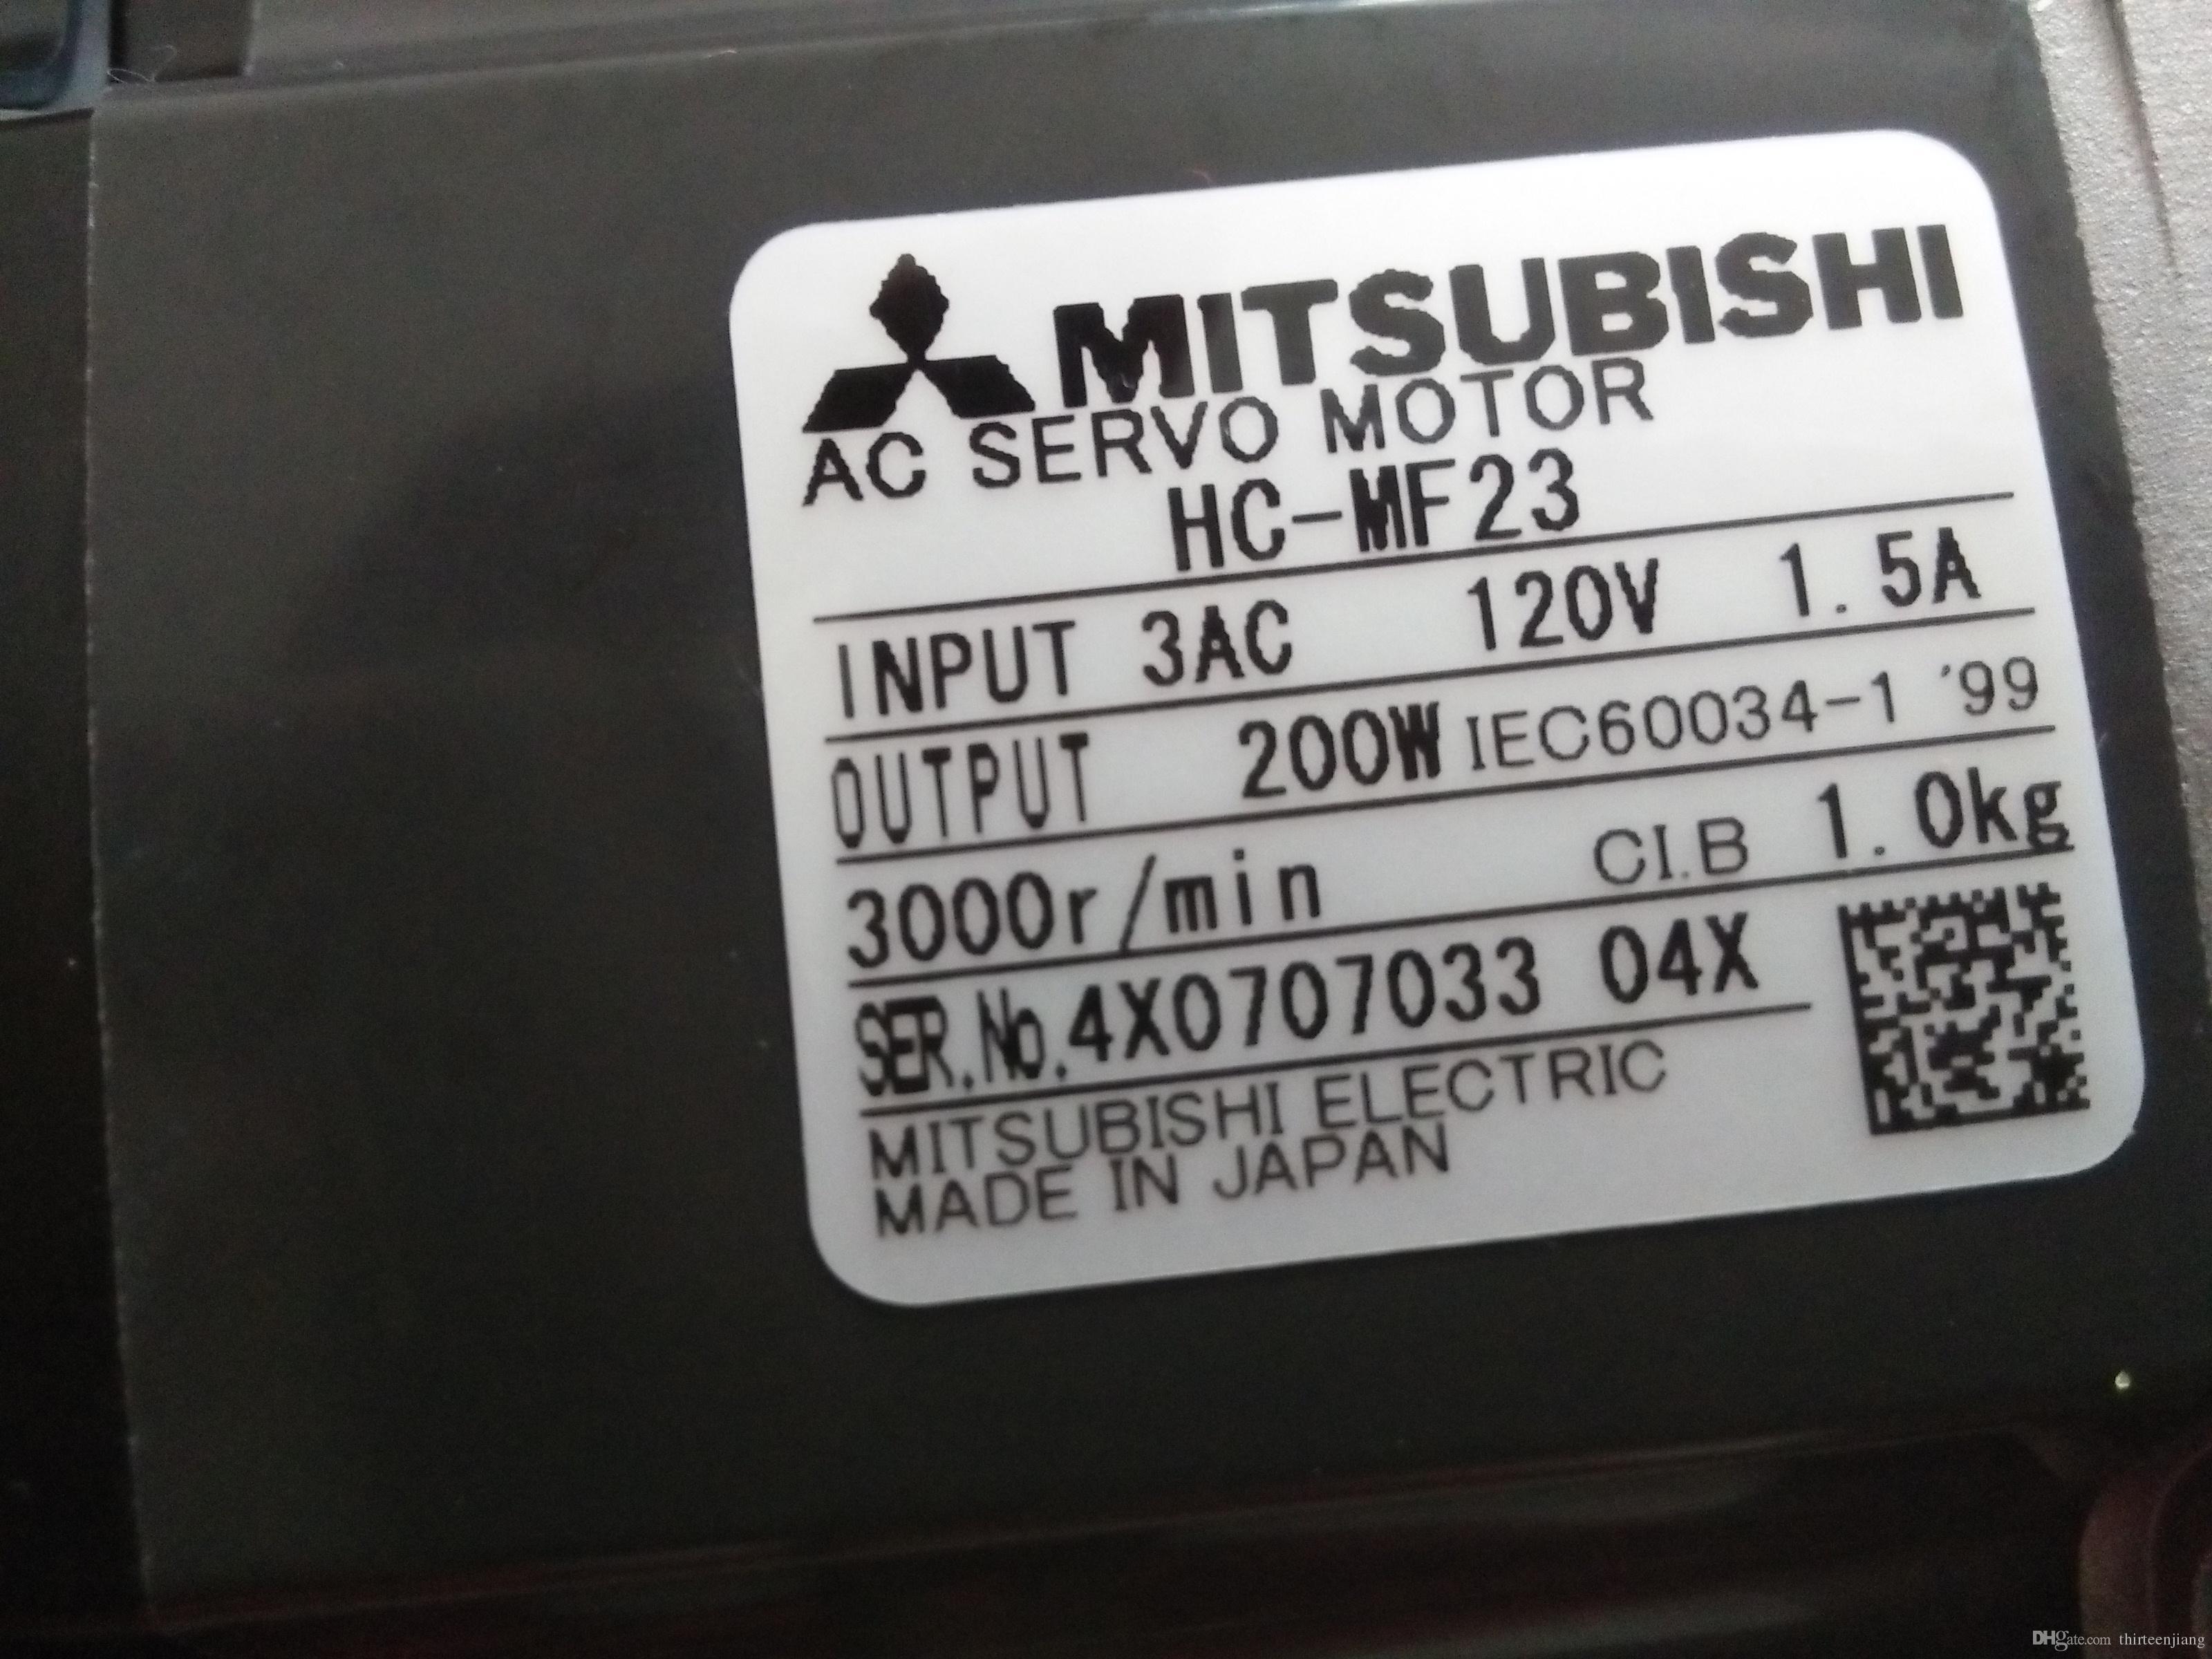 1 PC Mitsubishi AC Servo Motor HC-MF23 Novo / Usado Frete Grátis Expedido